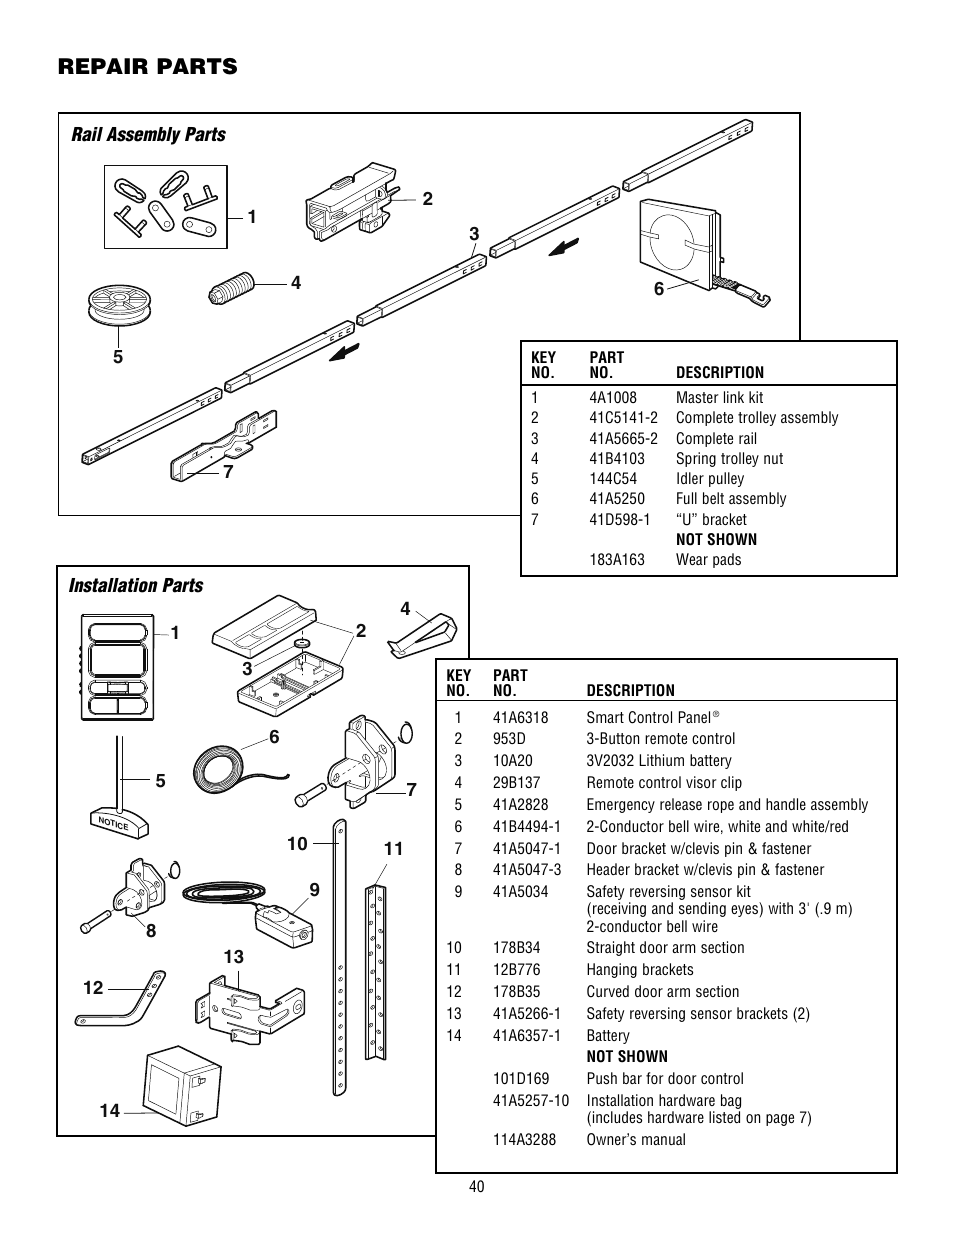 Repair Parts  Rail Assembly Parts  Installation Parts